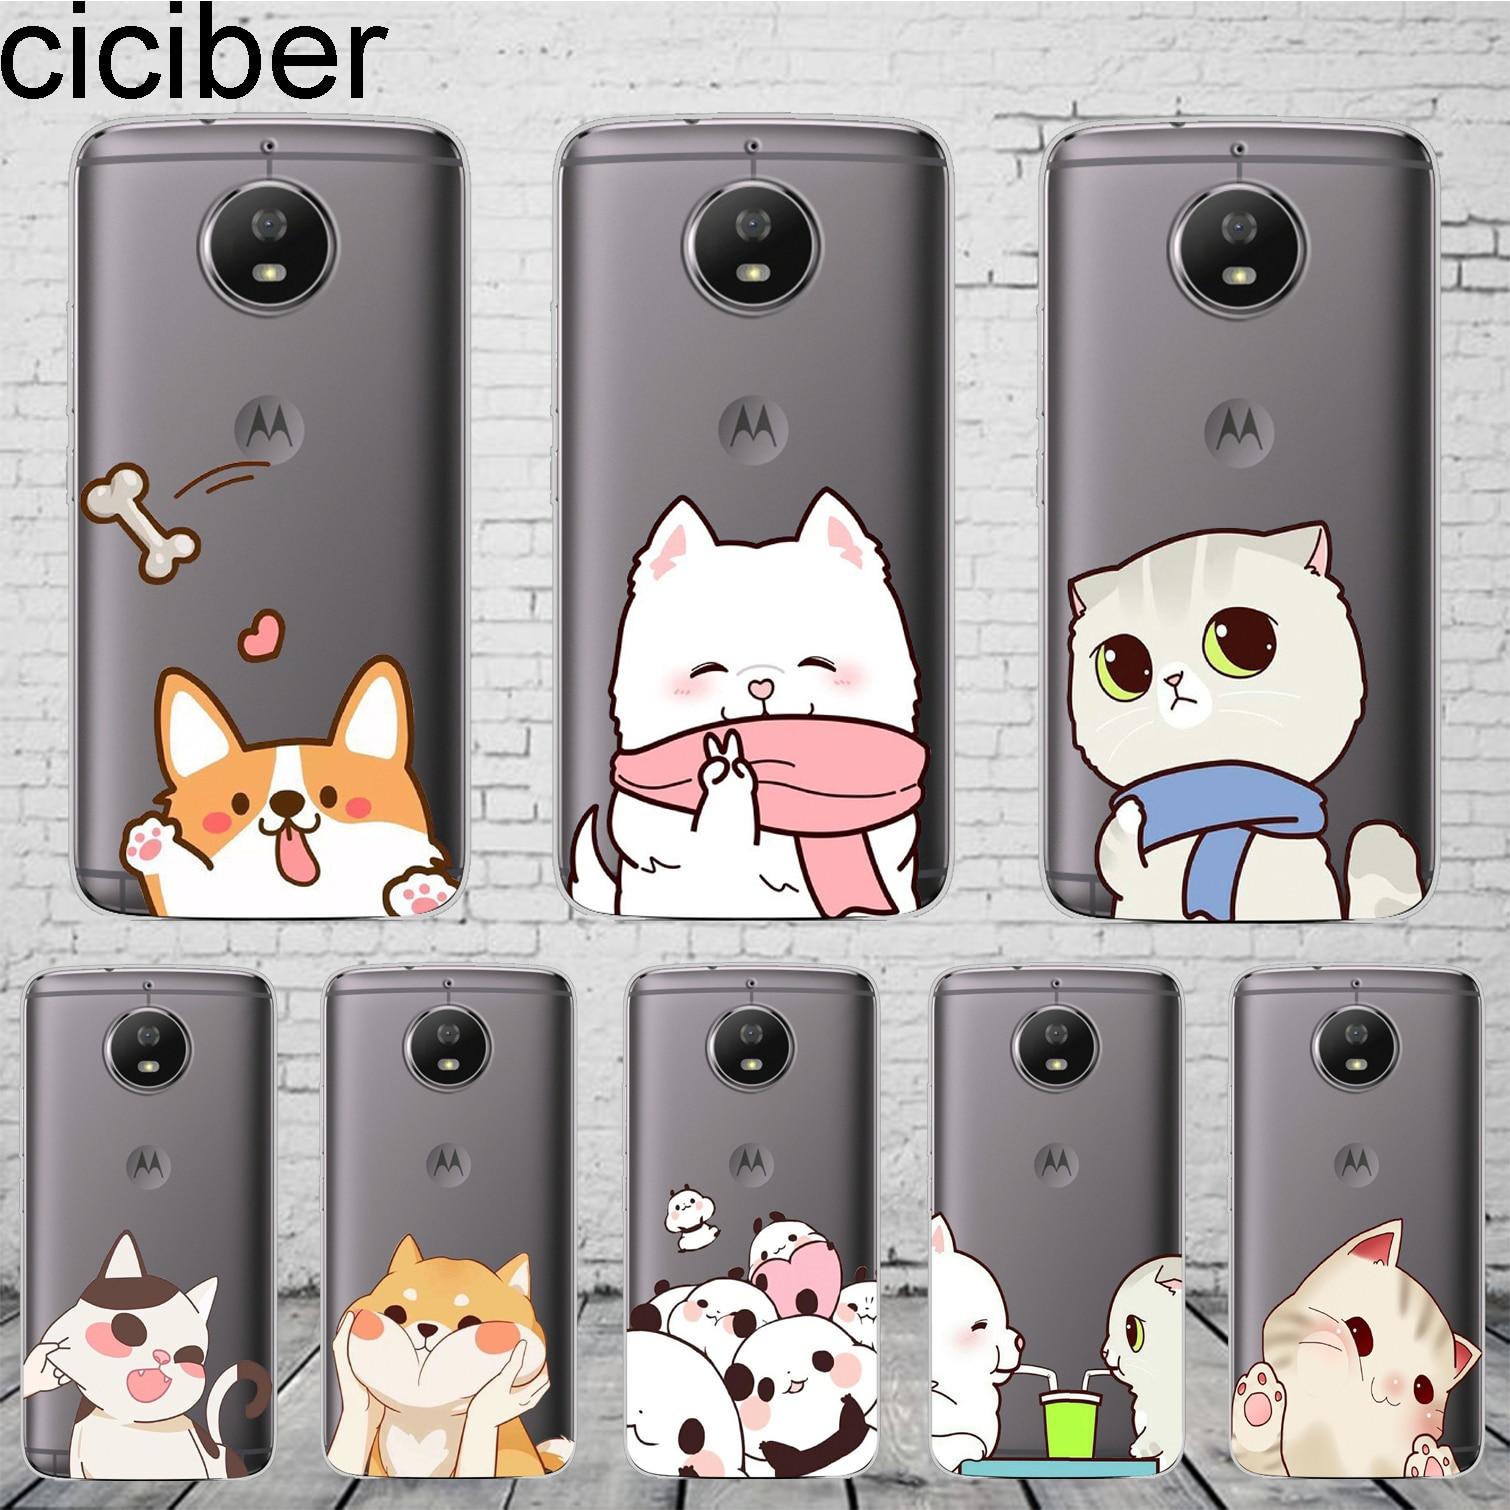 Cartoon Dog Cat Cover For Motorola Moto ONE C Z2 Z3 G5 G4 G5S G6 P30 E3 E4 E5 Plus Play Power X4 M Phone Cases Soft TPU